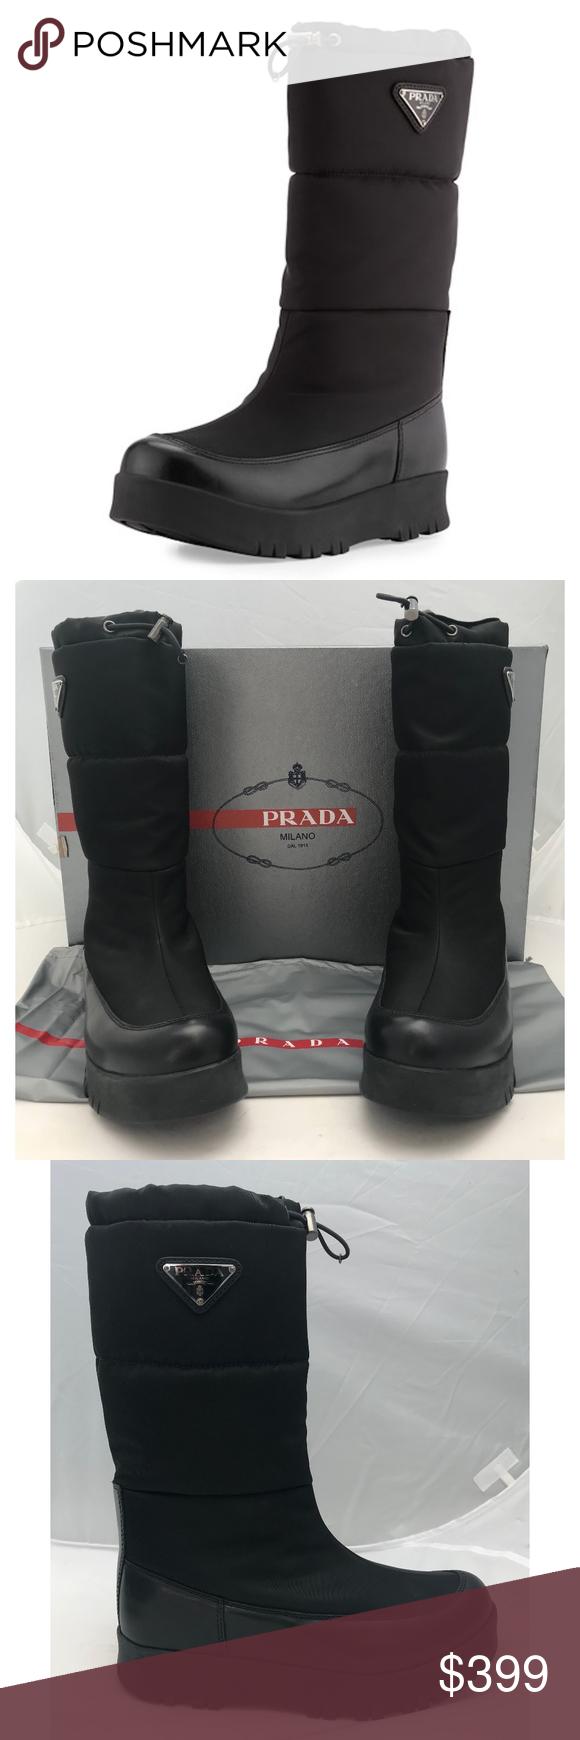 18189bb3 New Prada Platform Snow Boots Logo Black SZ 38 Authentic Prada Linea ...